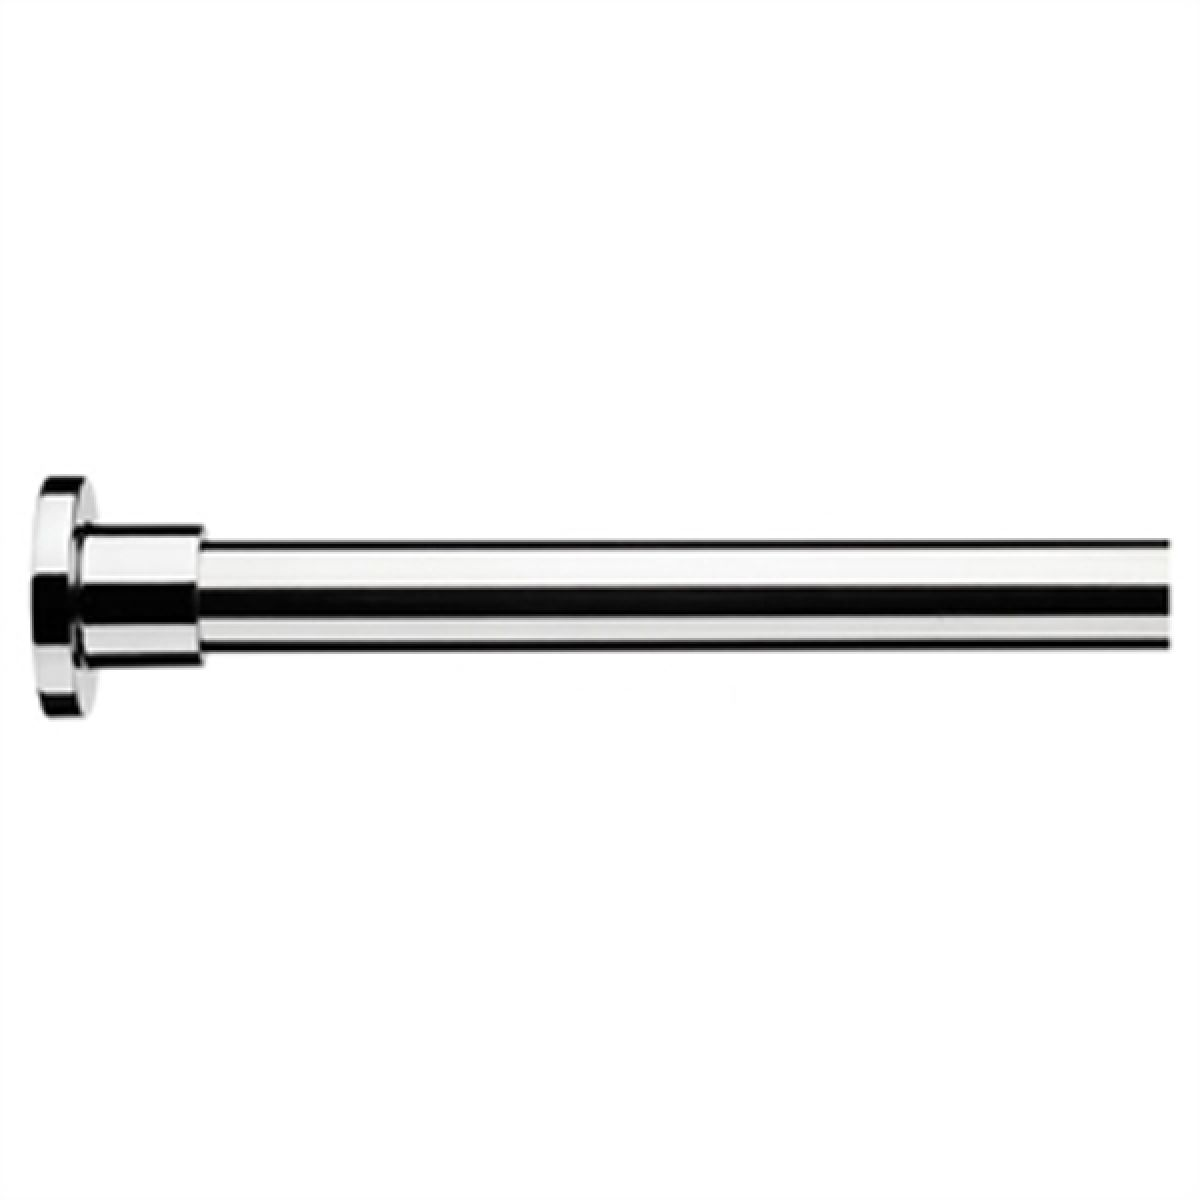 Croydex Superline Modular Shower Curtain Rail Kit Chrome